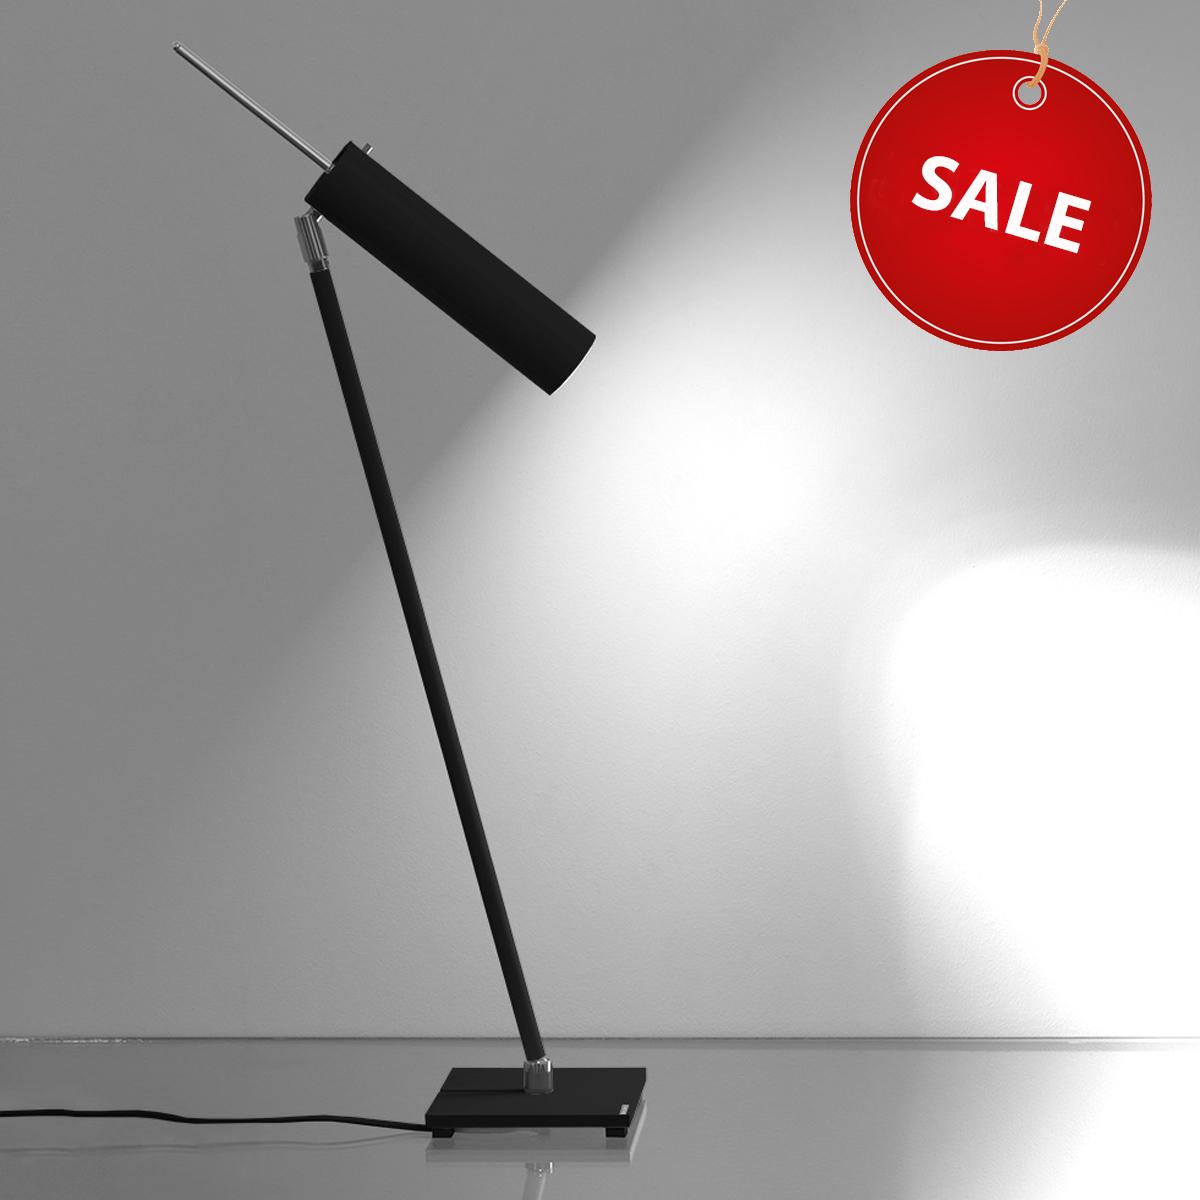 catellani smith lucenera 500 tischleuchte halogen. Black Bedroom Furniture Sets. Home Design Ideas